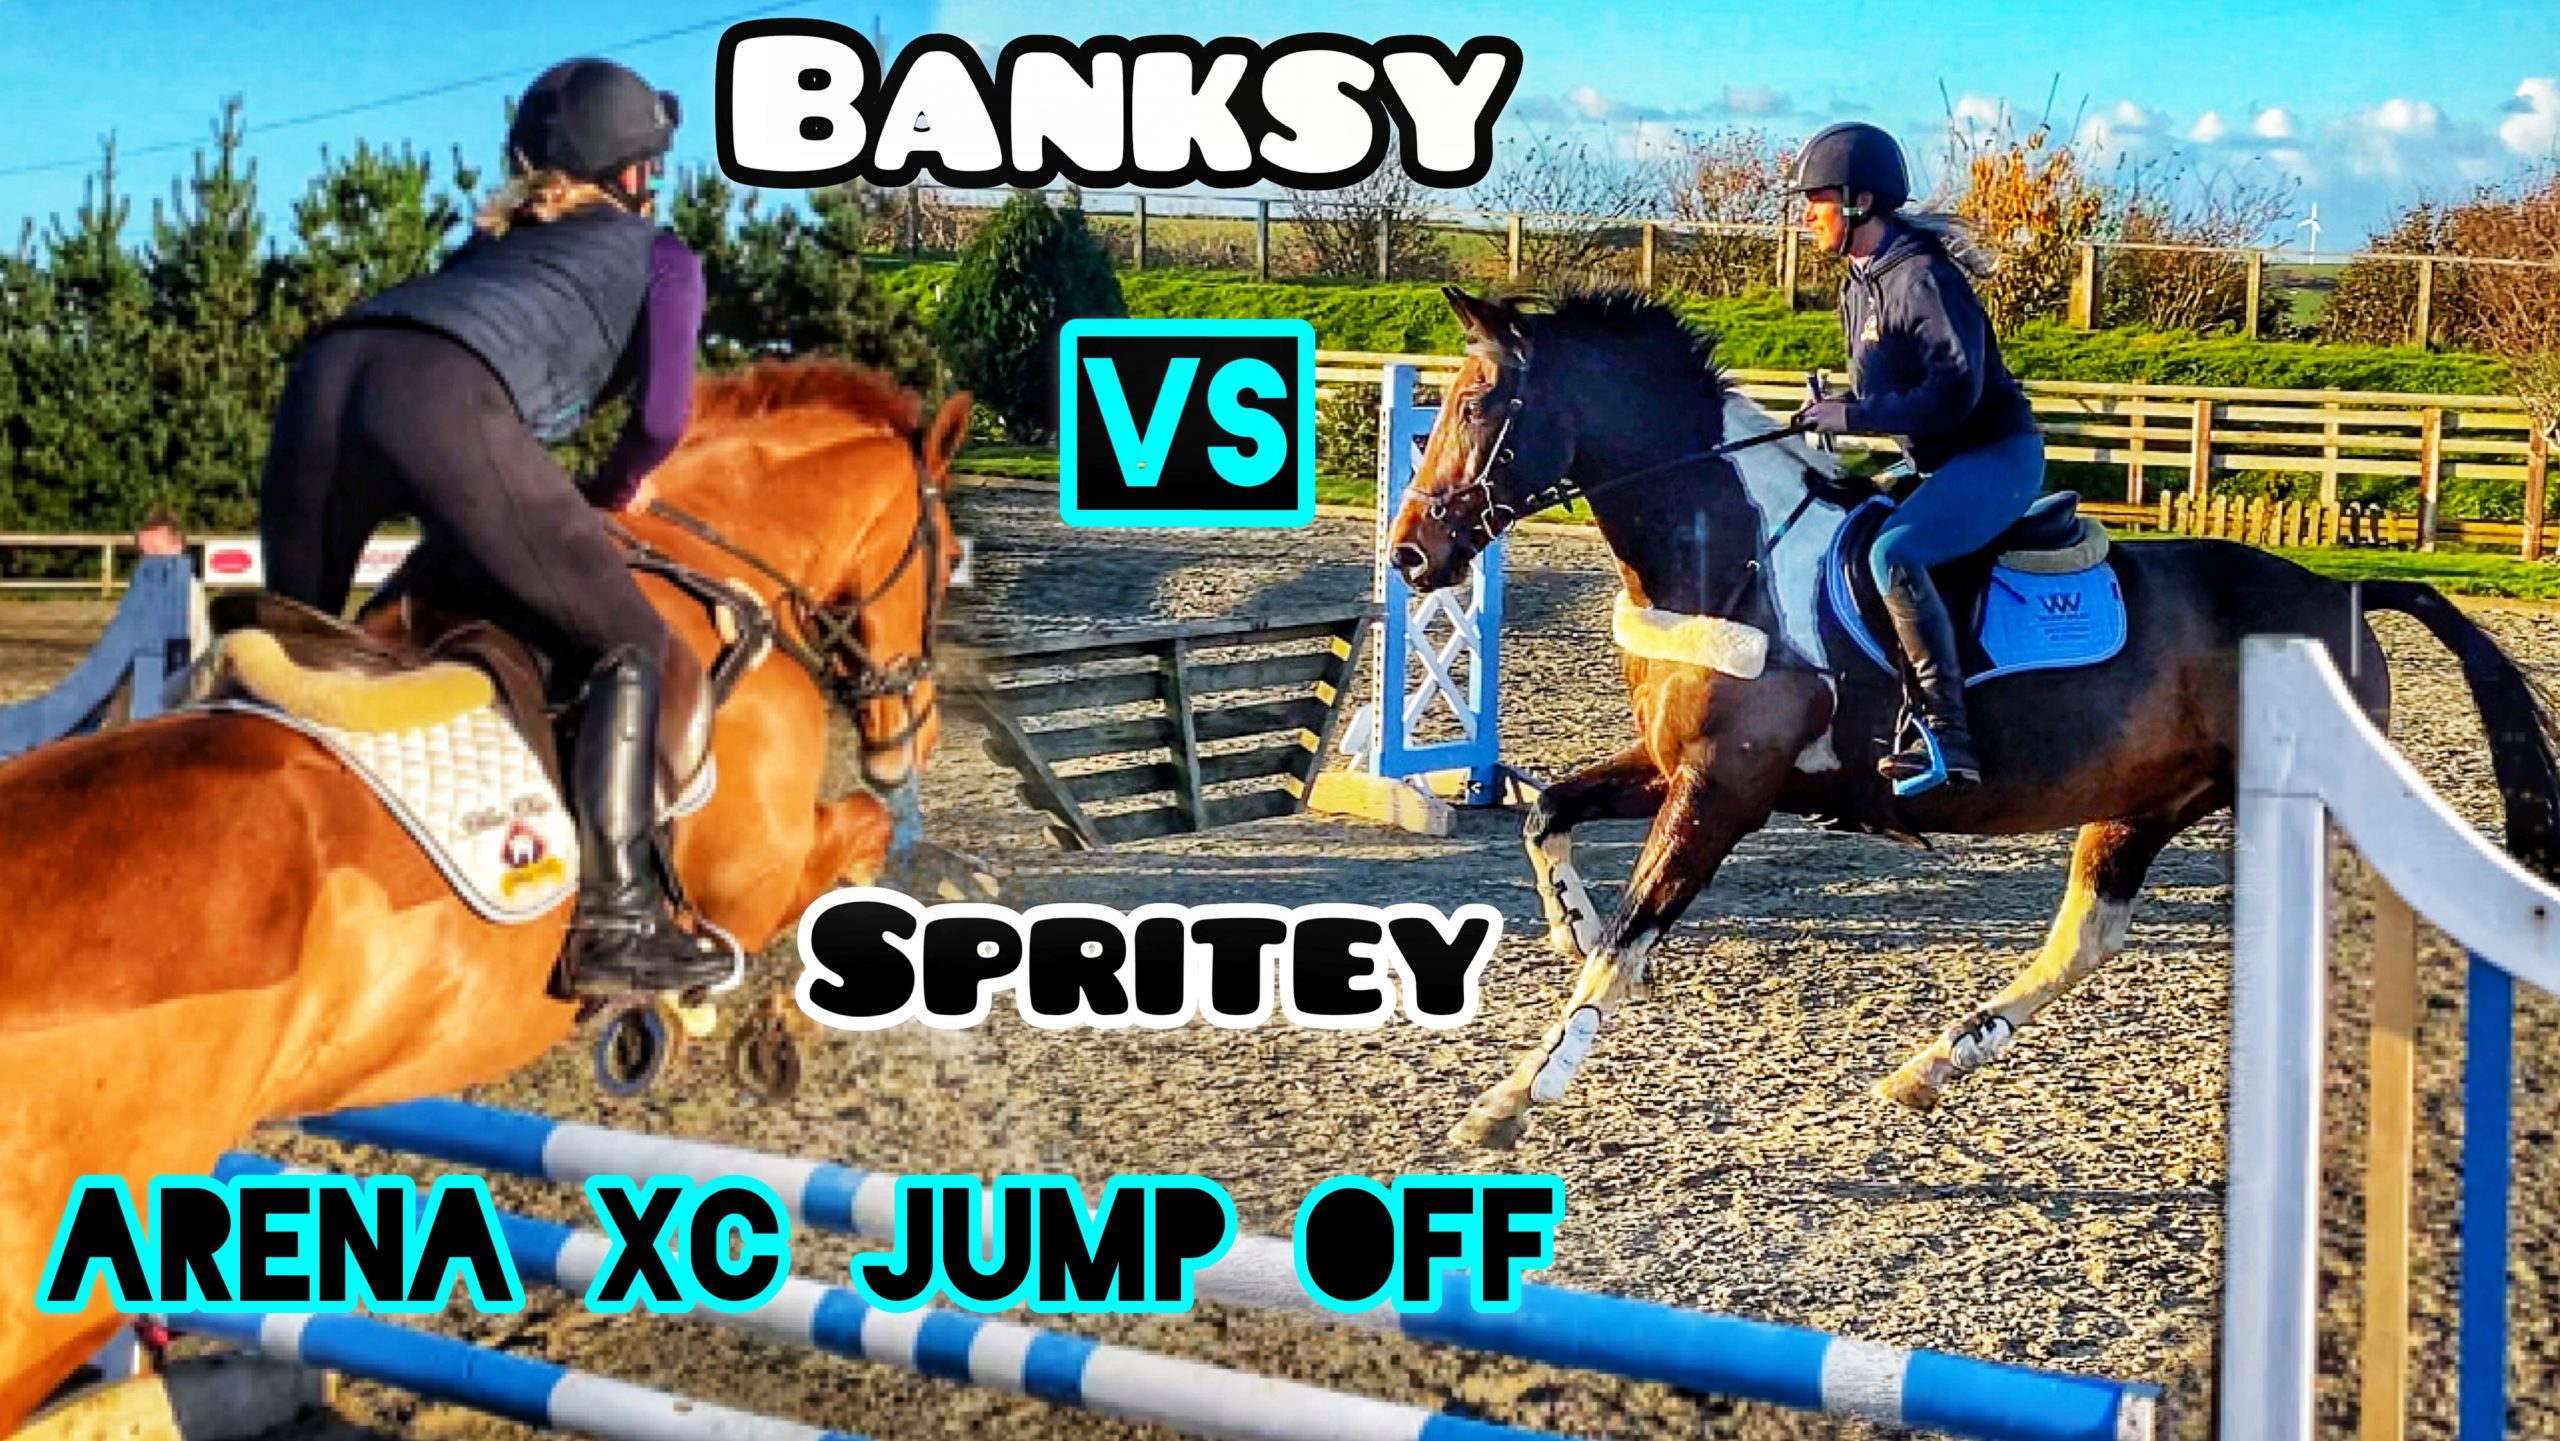 ARENA XC JUMP OFF | Banksy VS Spritey Head to Head… Who will WIN?? #EmTeeEventures